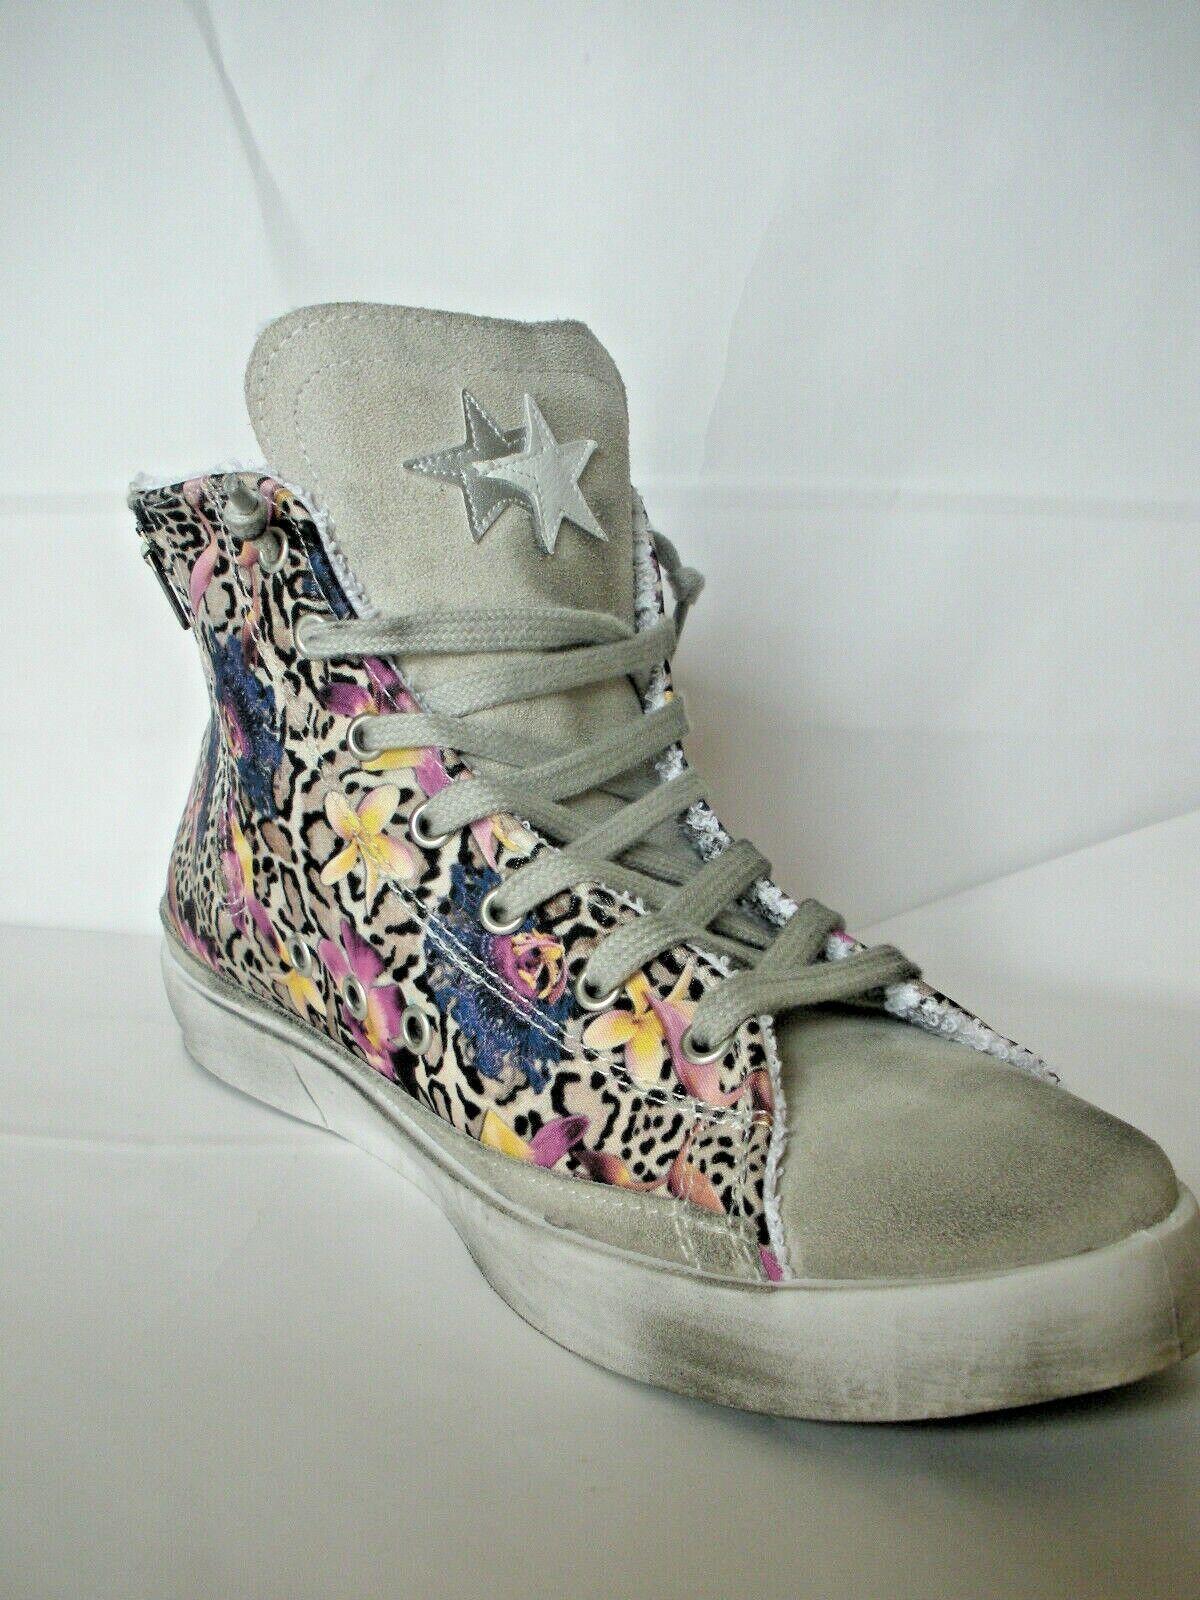 2 Star Sneaker High Flowers 60% Discount Last No. 40